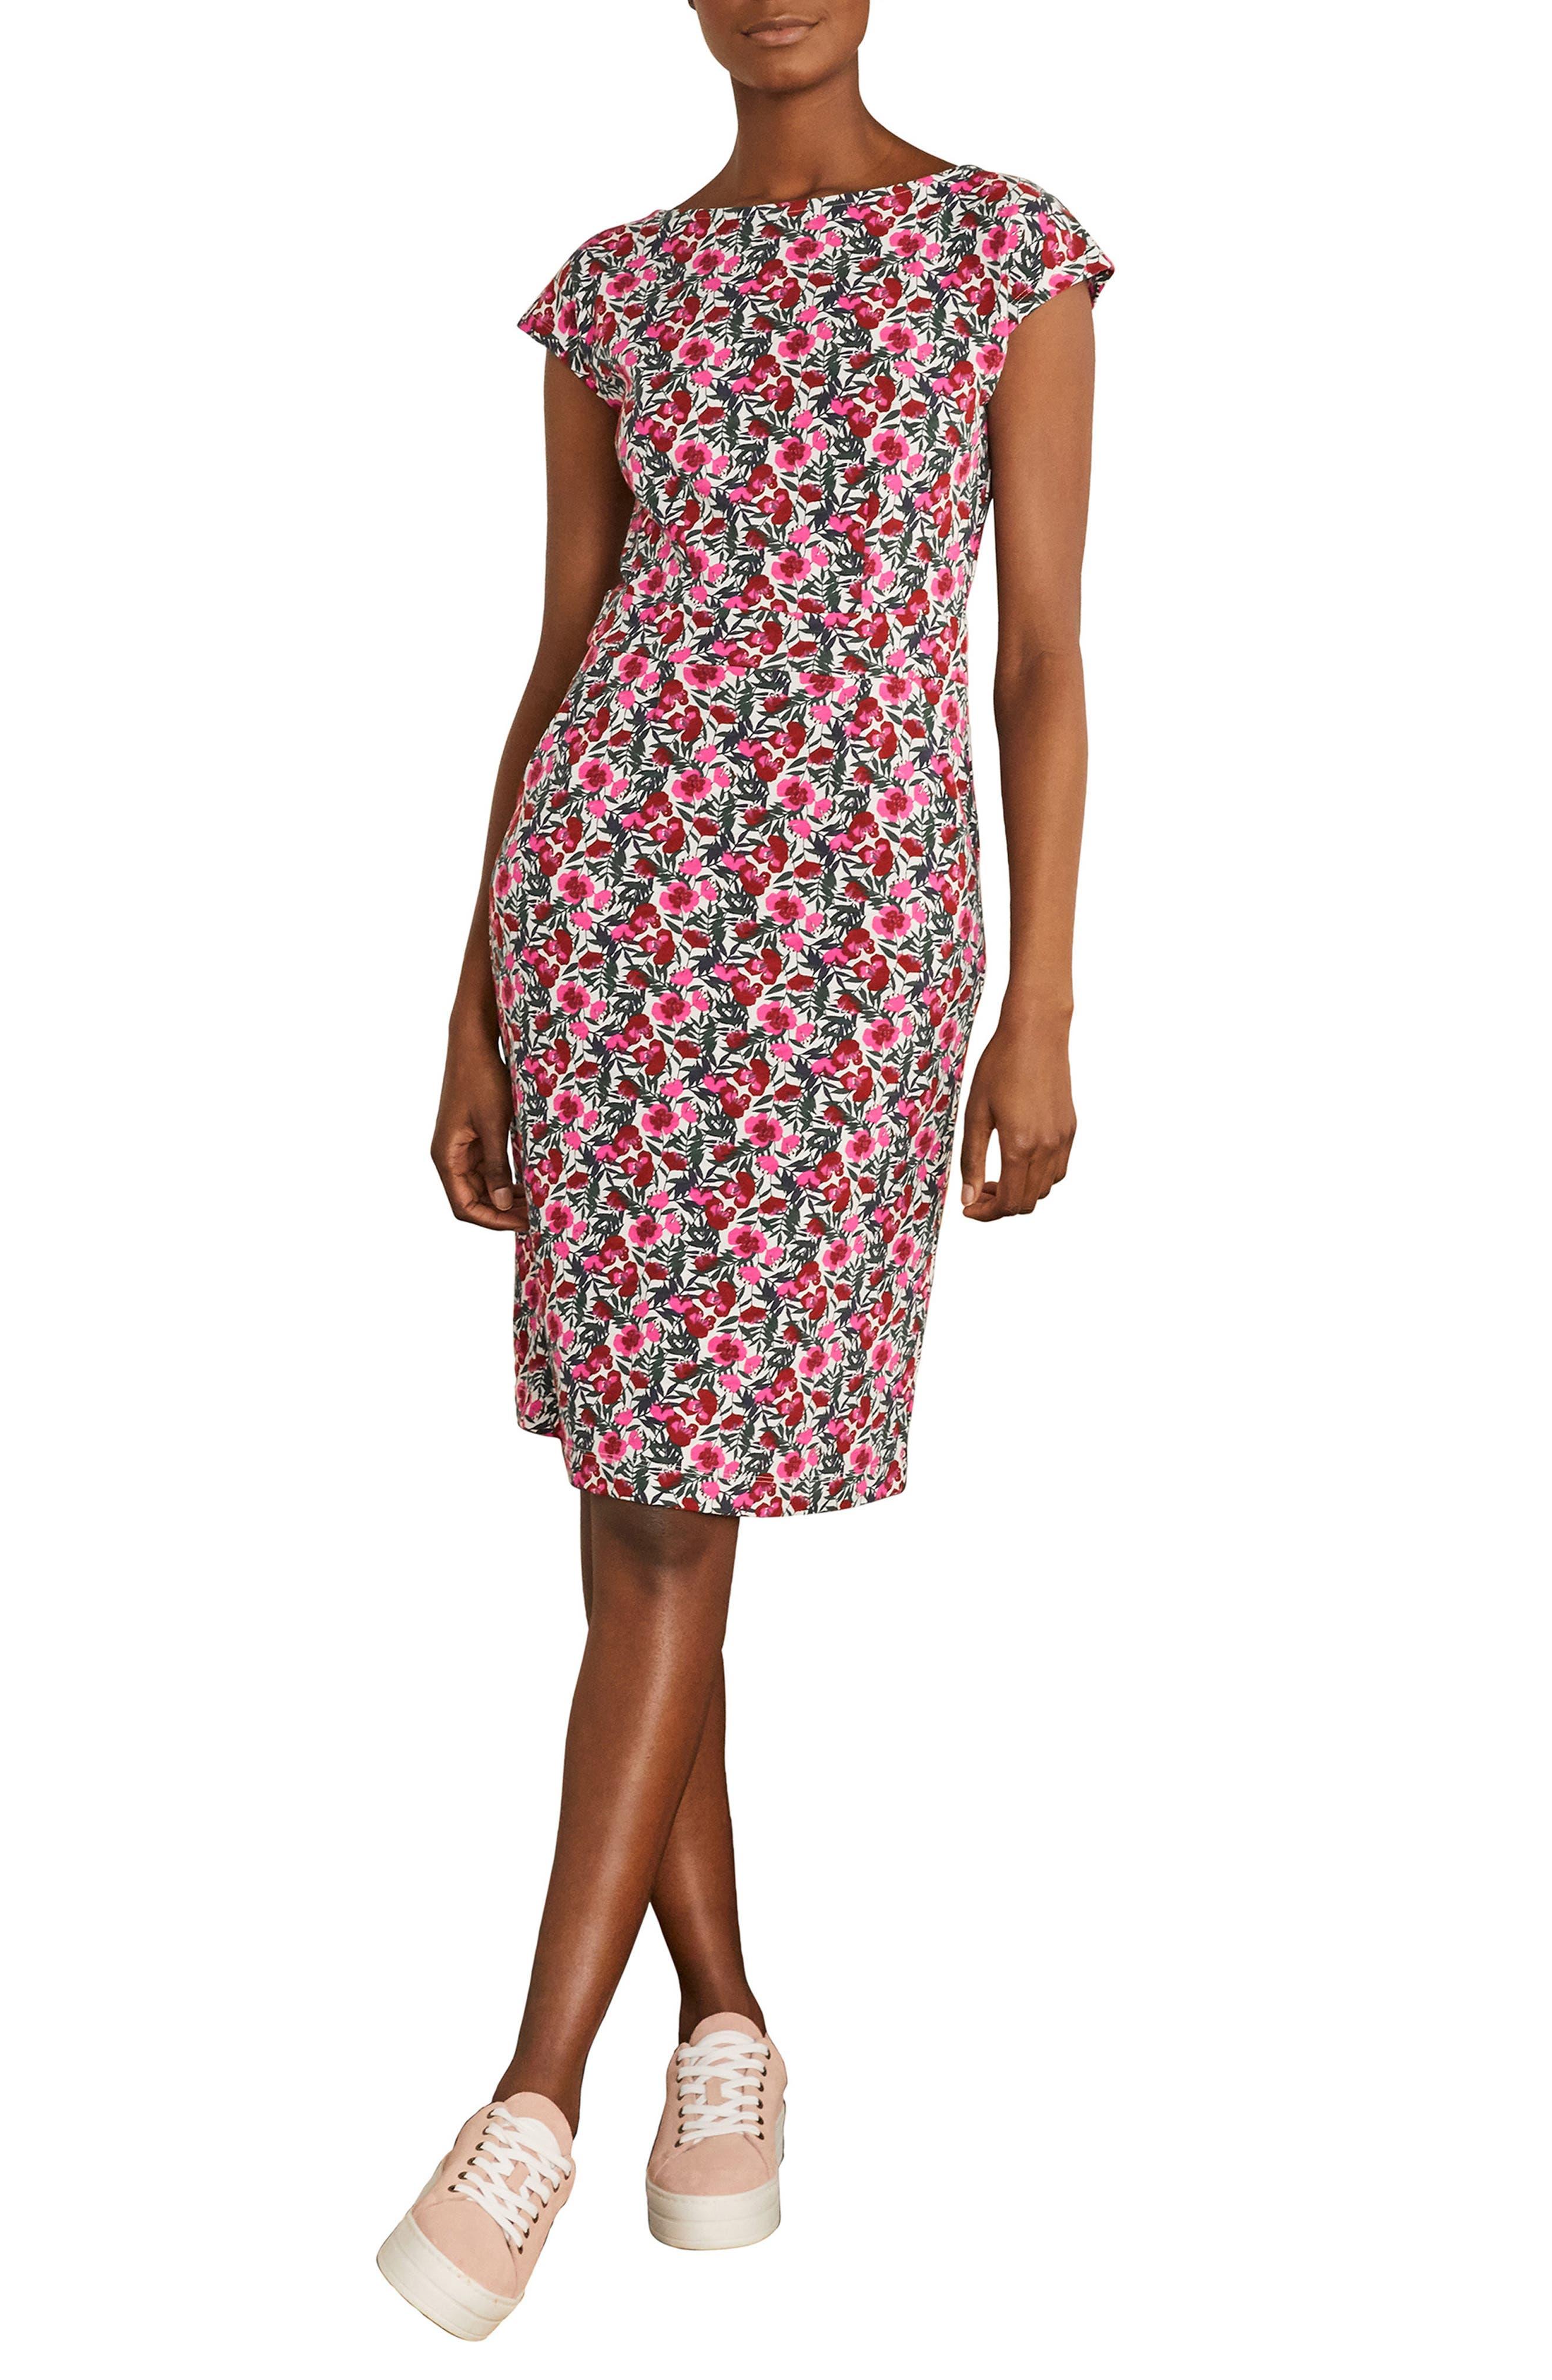 Florrie Floral Jersey Dress